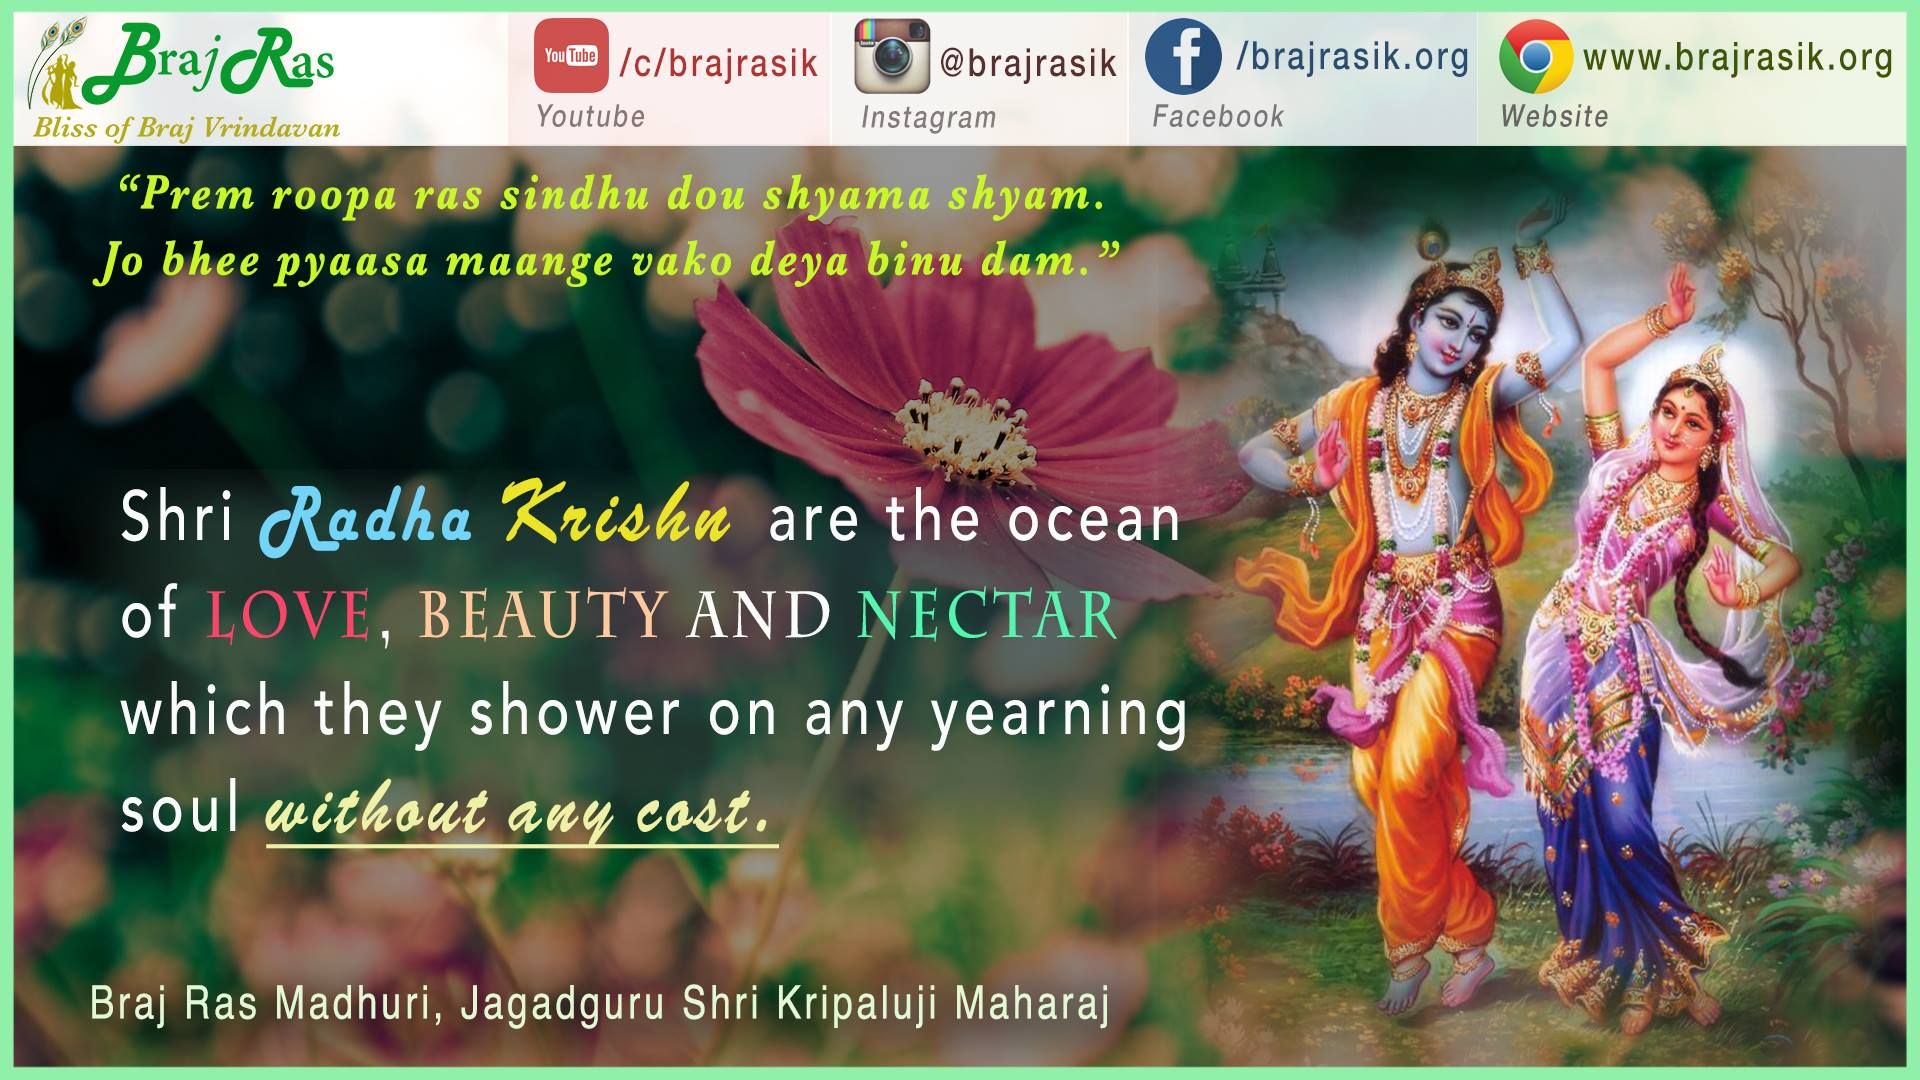 Prem Roopa Ras Sindhu Dou Shyama Shyam - Shyama Shyam Geet